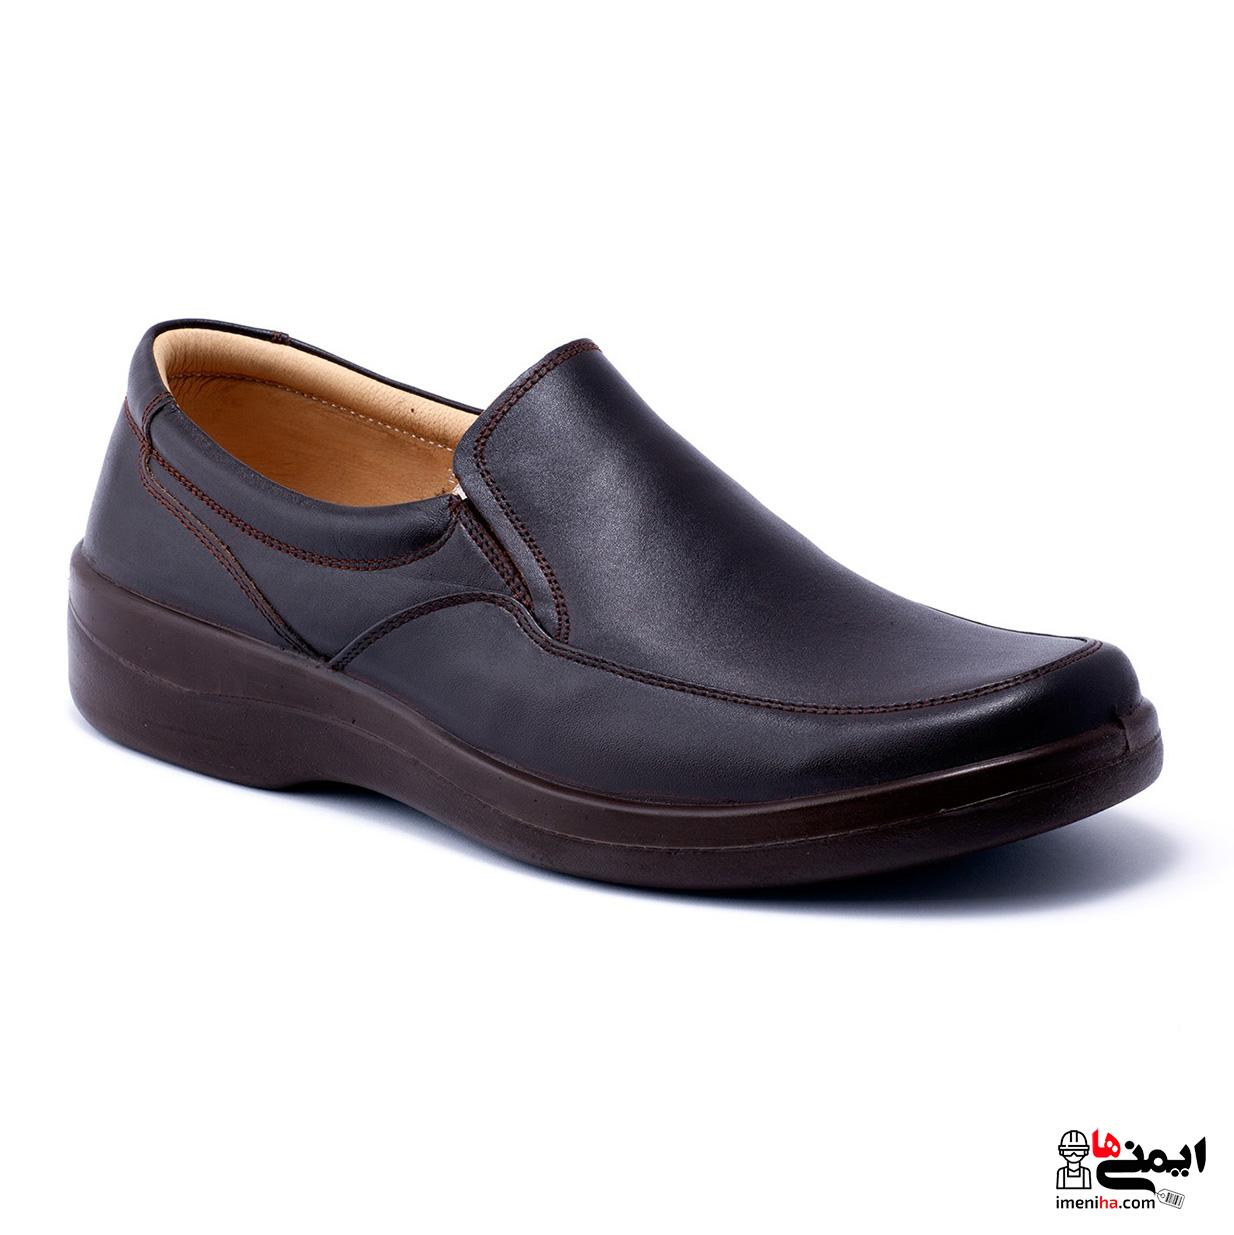 کفش چرم اداری - کفش کار